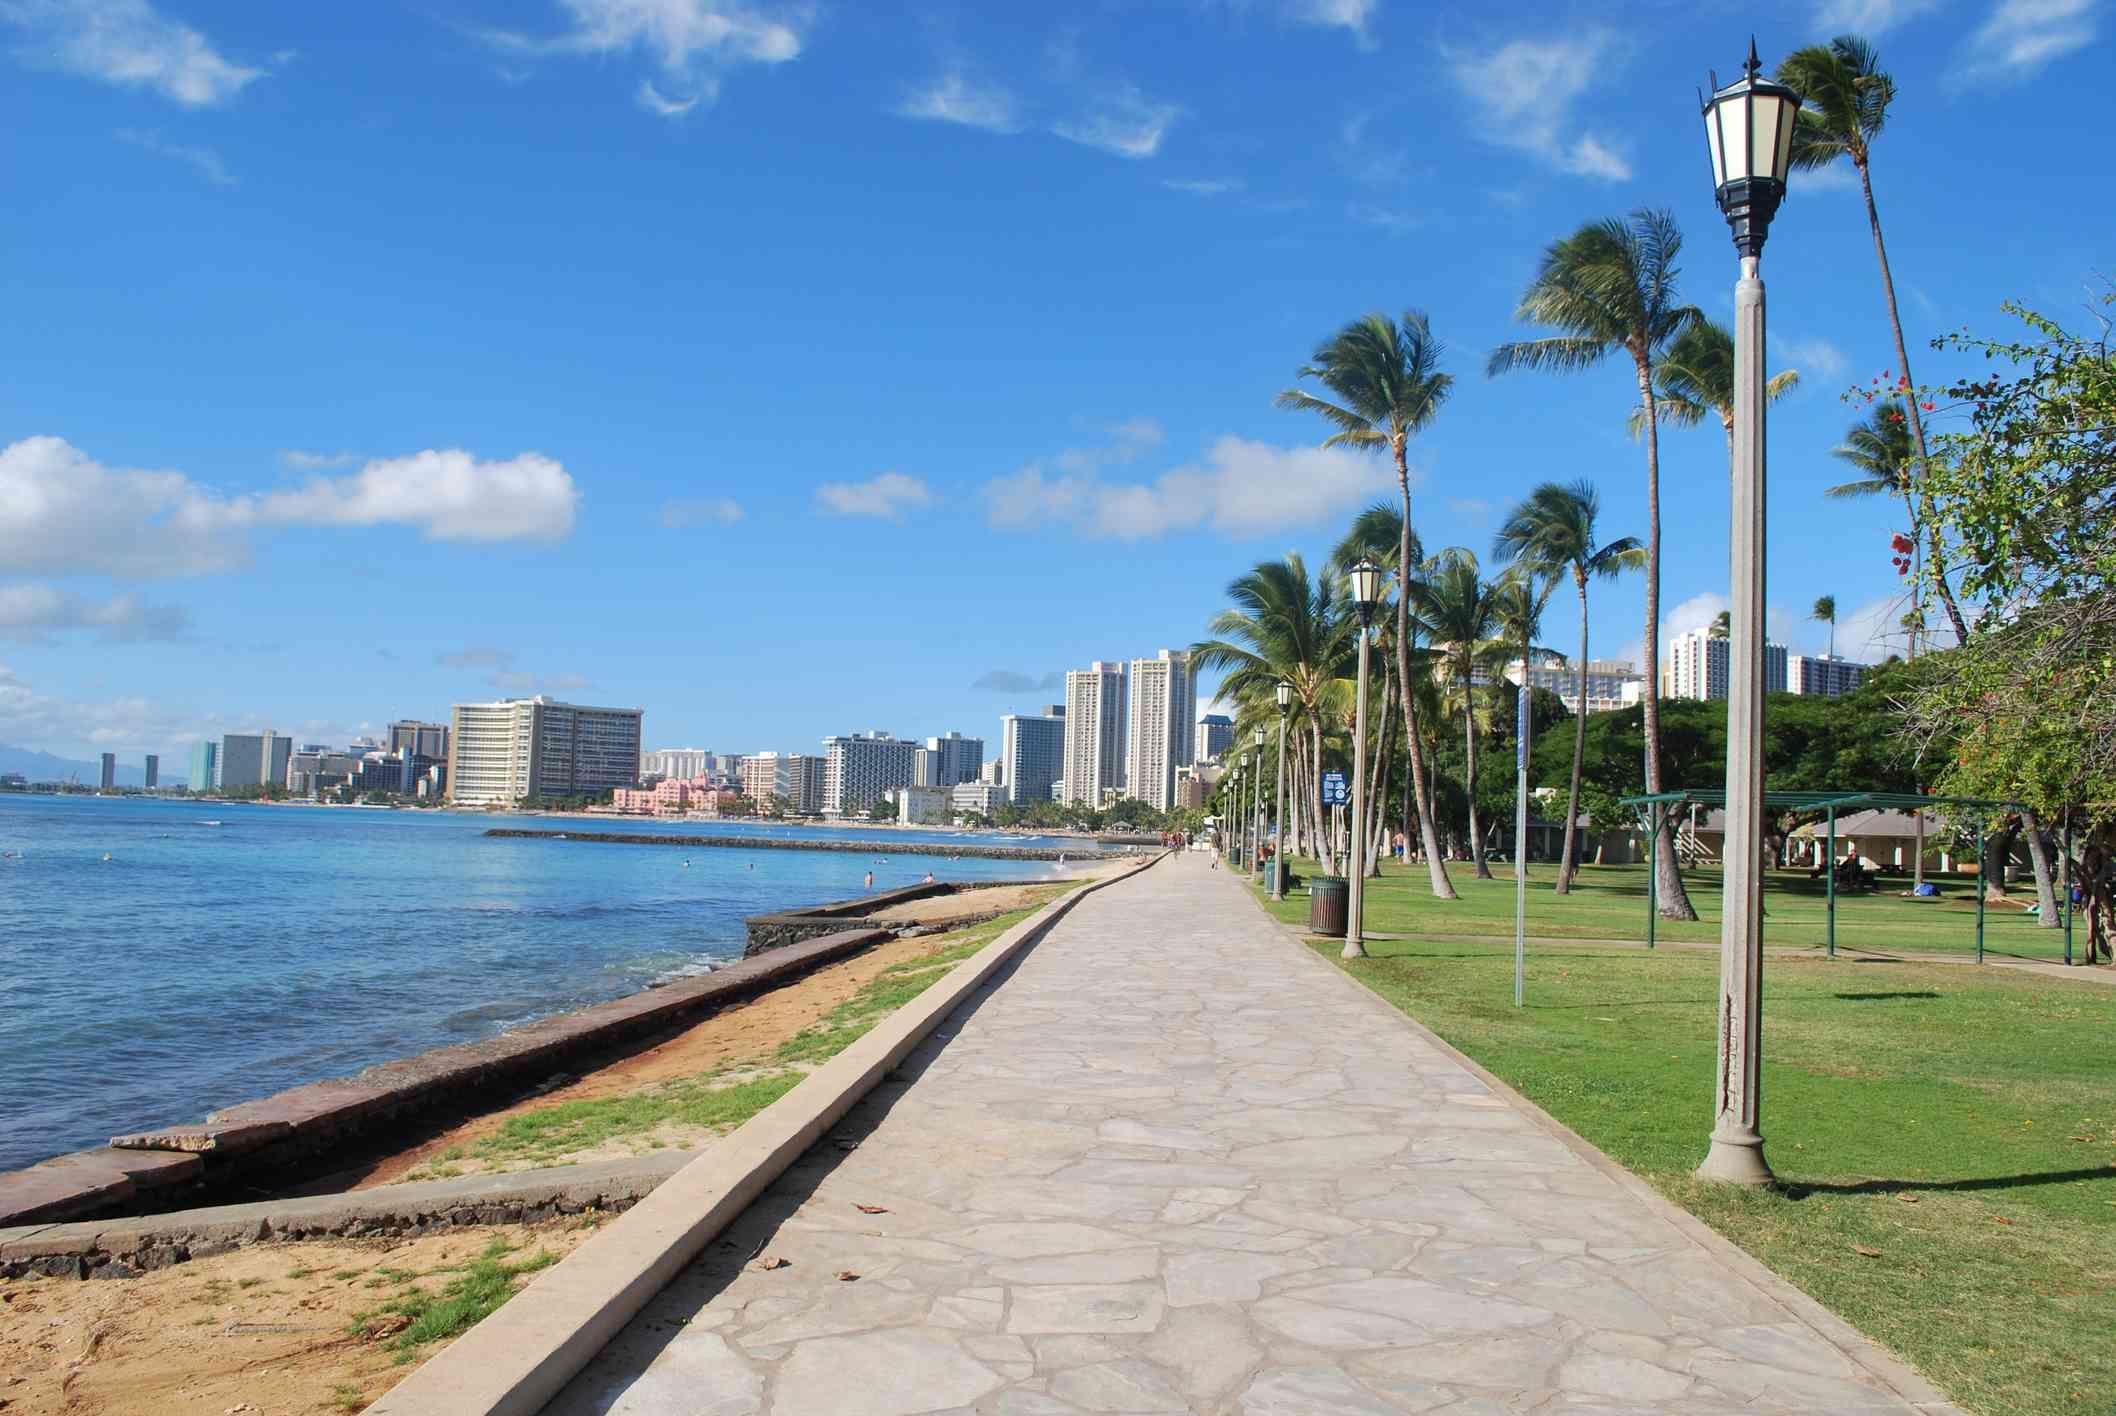 Queen Kapiolani Park in Oahu, Hawaii